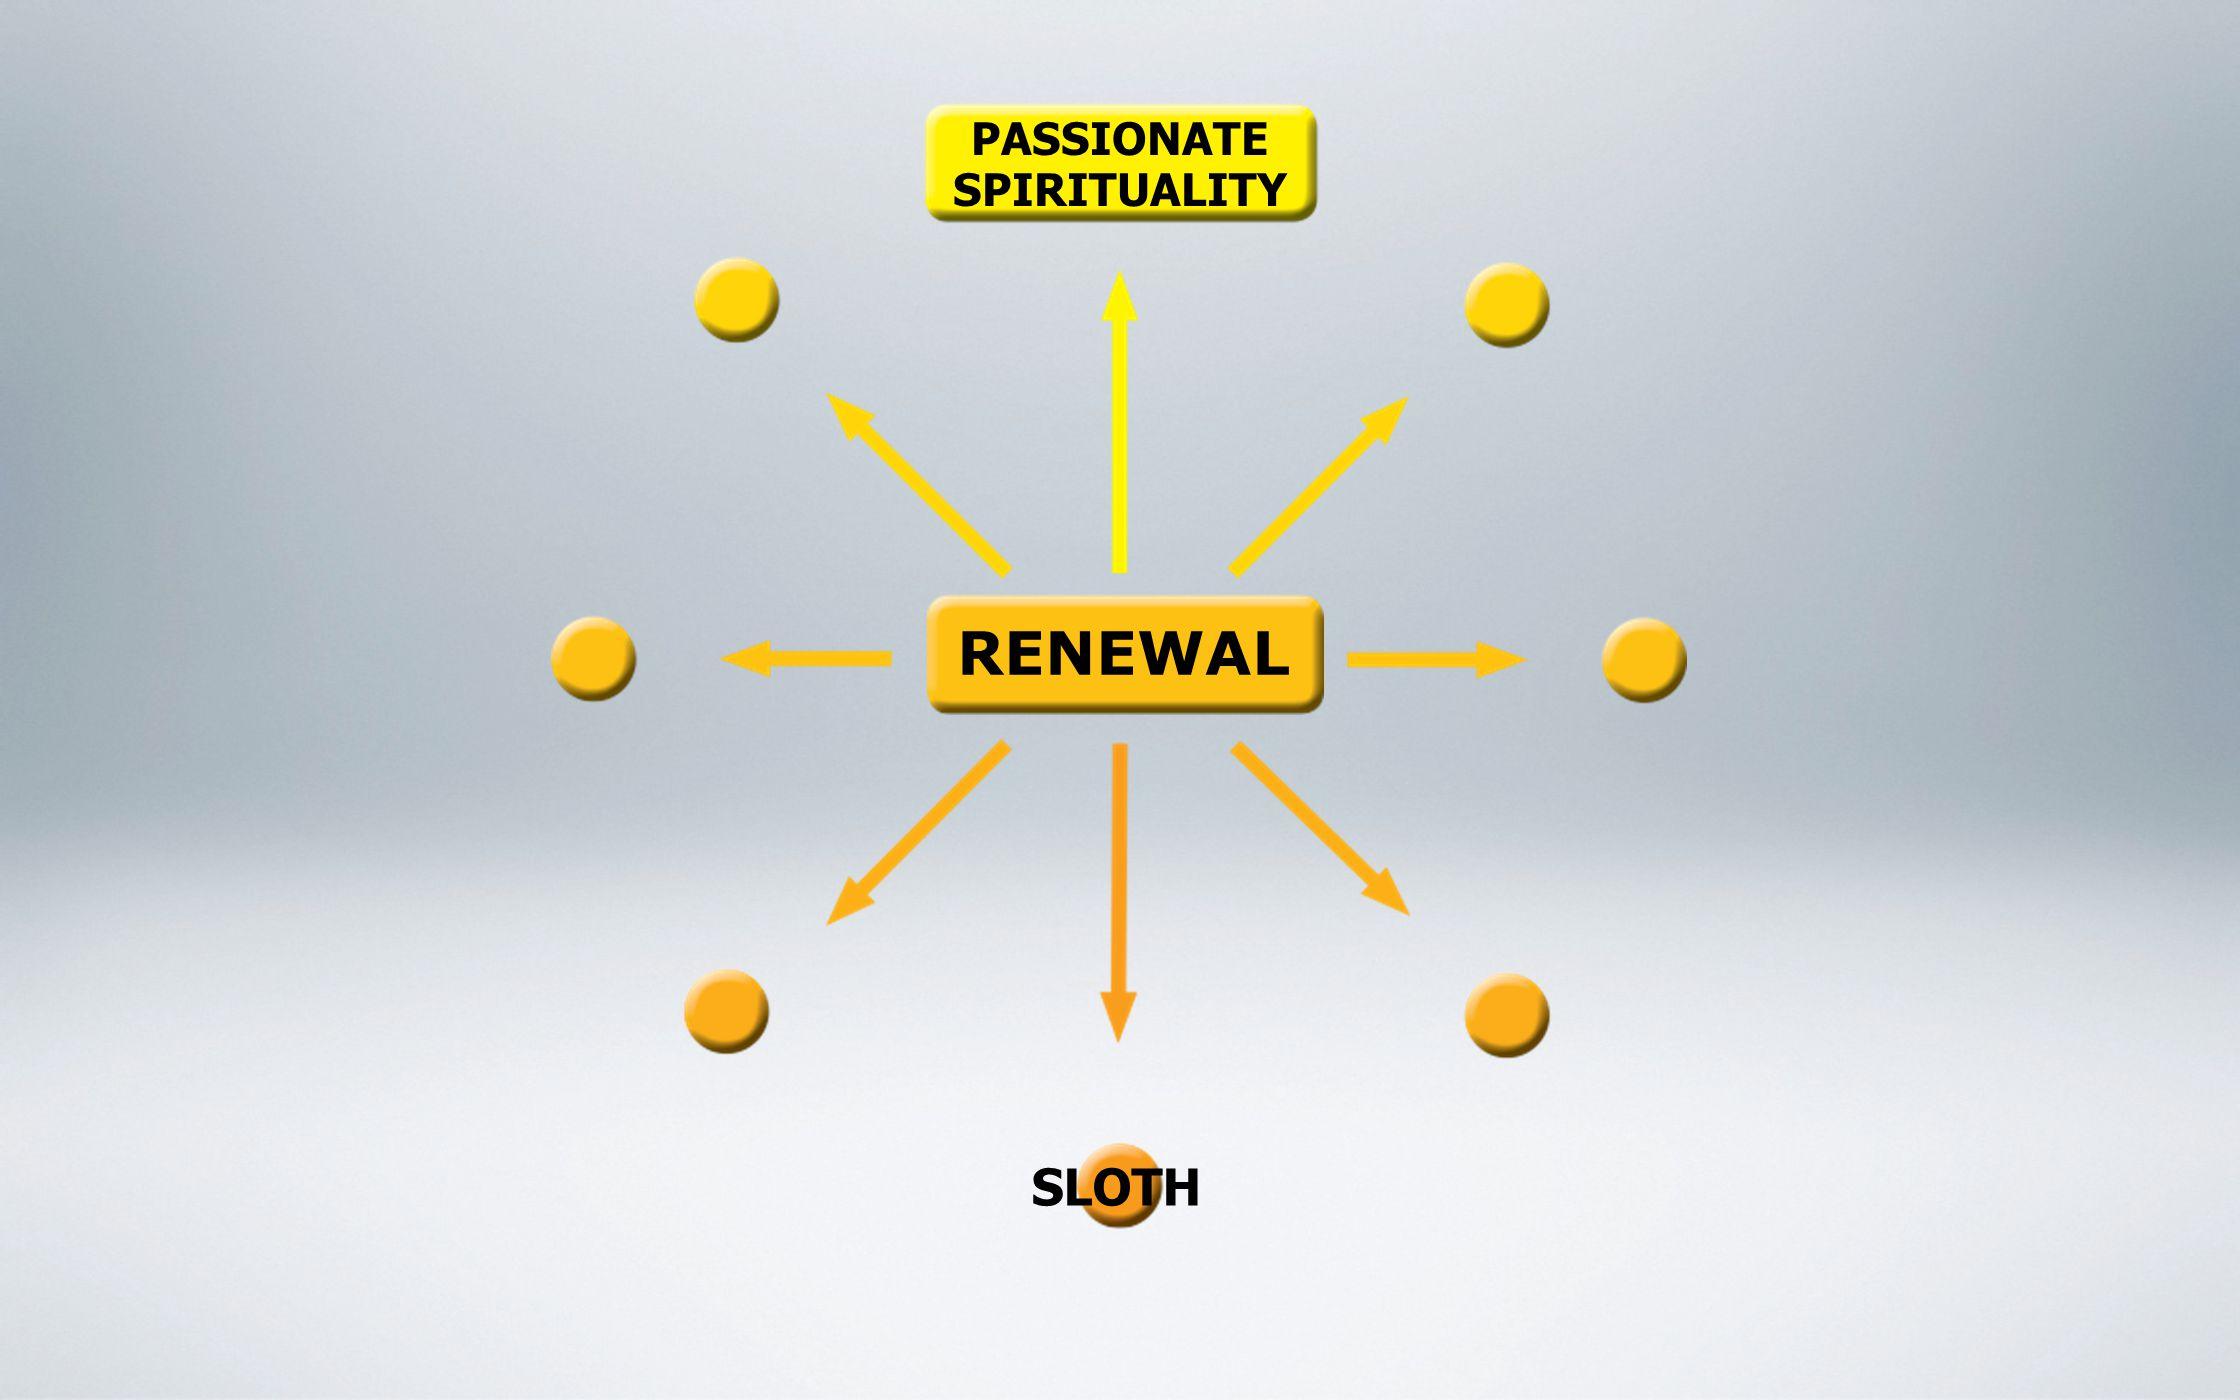 SLOTH PASSIONATE SPIRITUALITY RENEWAL